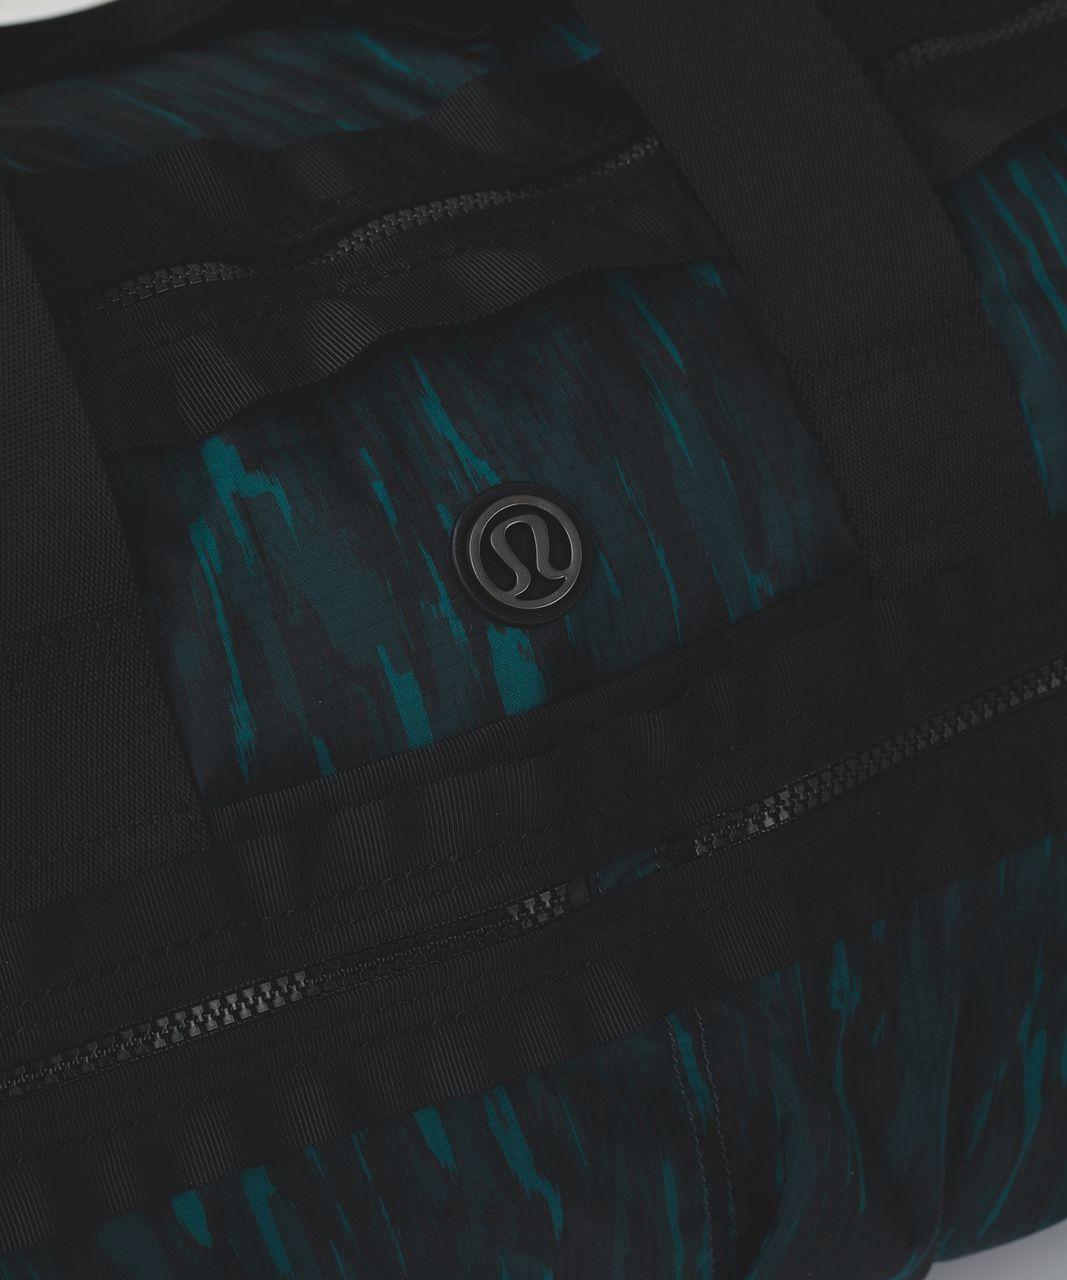 Lululemon Gym To Win Duffel - Painted Animal Forage Teal Dark Fuel / Black